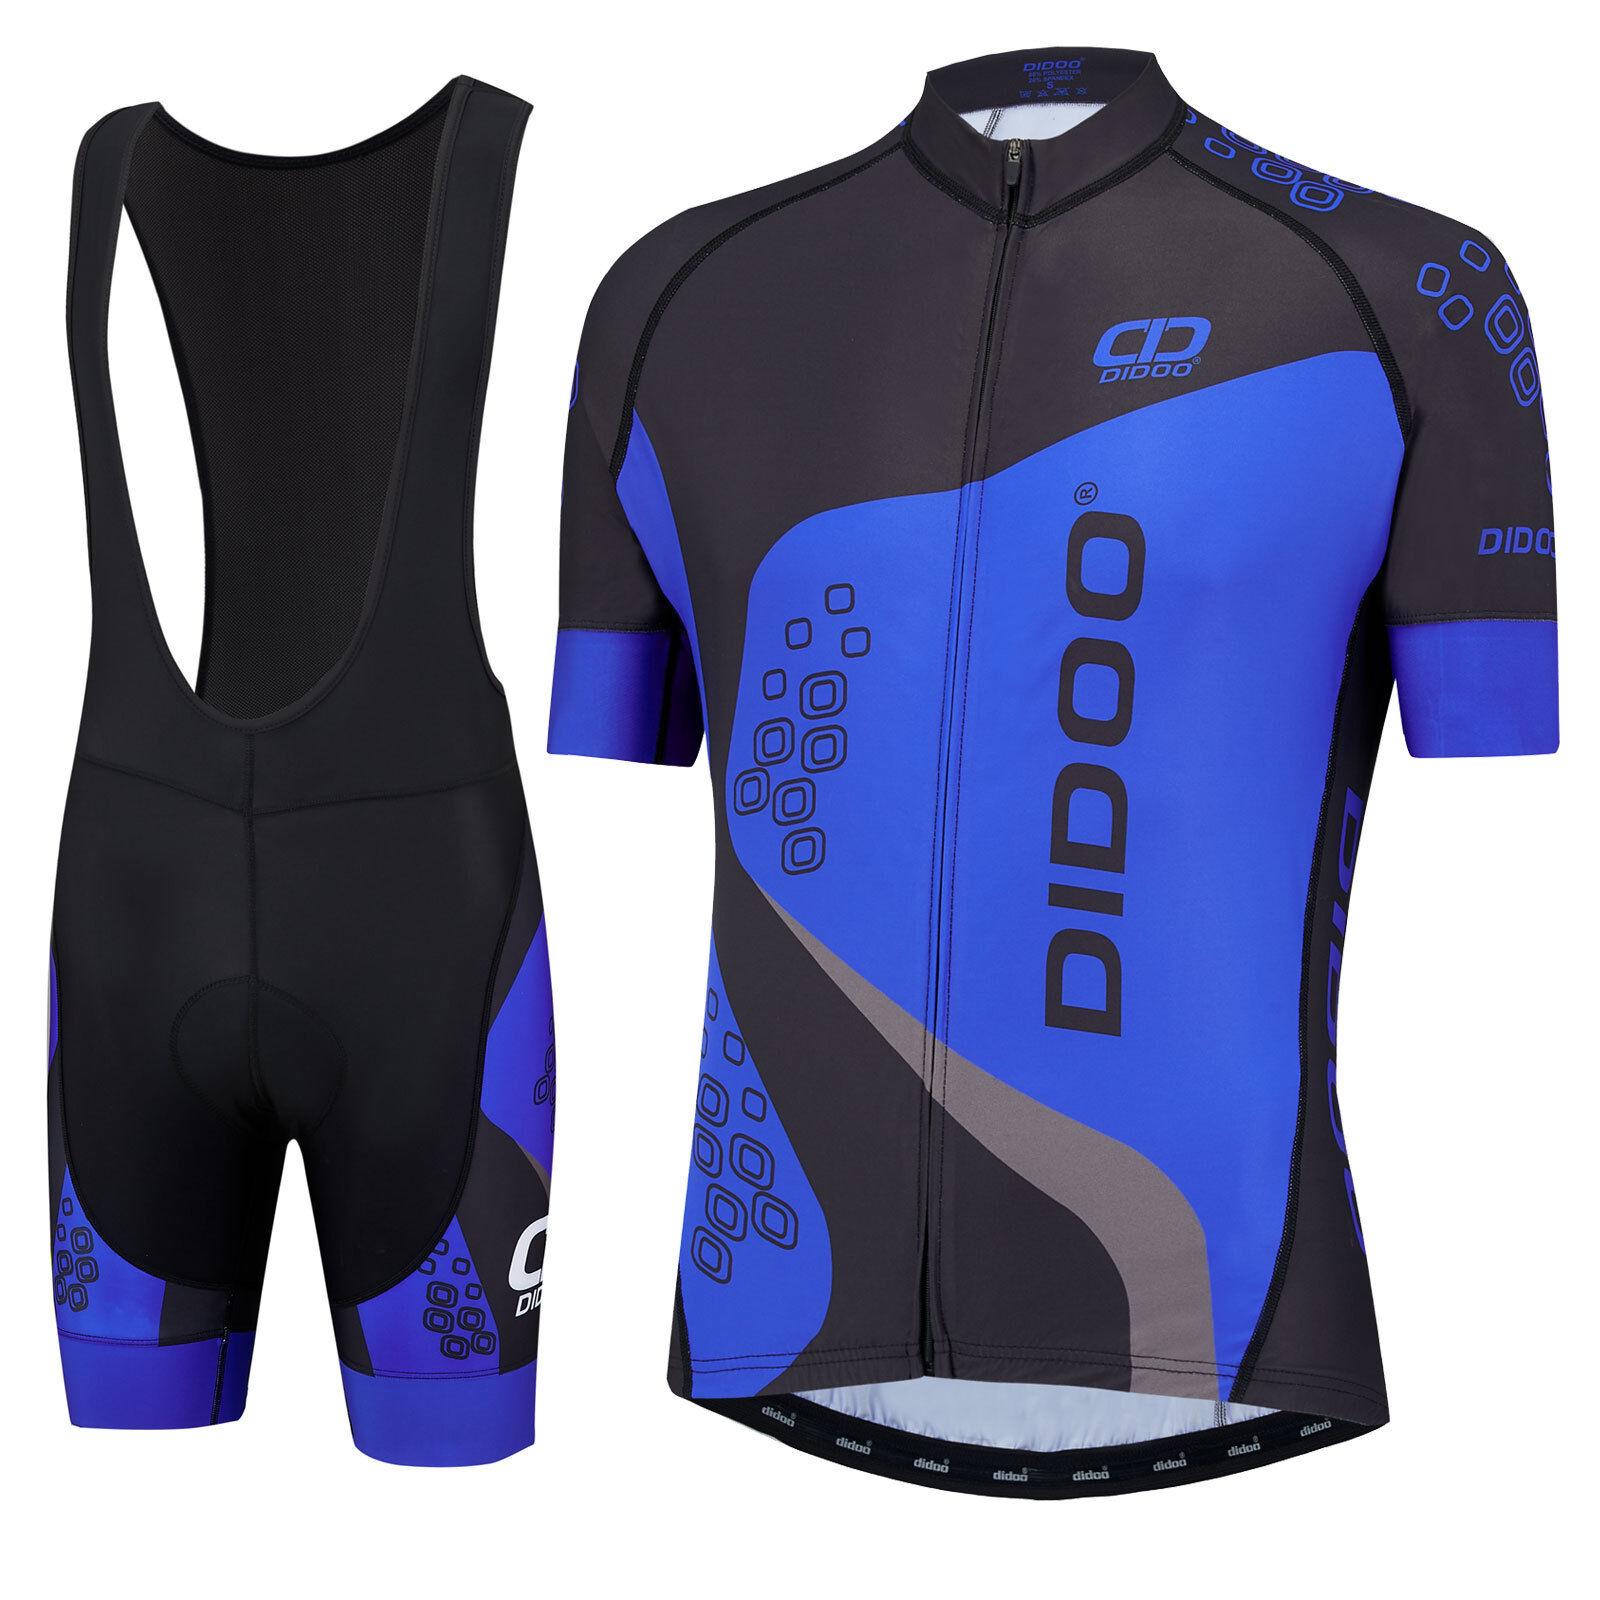 Didoo New Half Sleeve Cycling Jersey and Padded Bib short Set Bike Top MTB 2PC